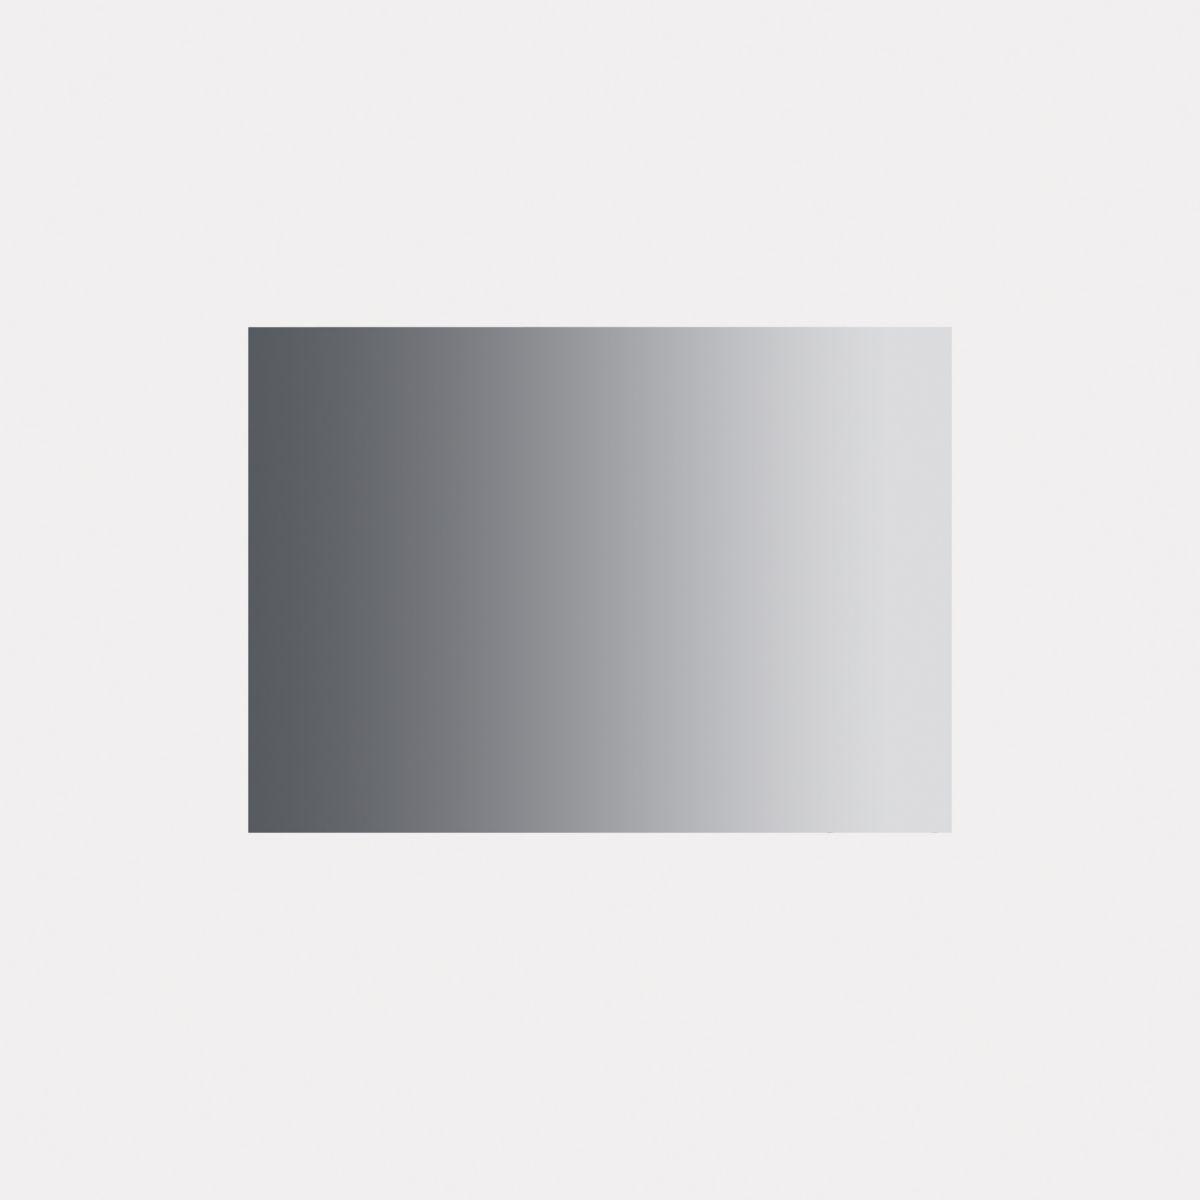 Crédence SMEG KITC9X9-1 portofino